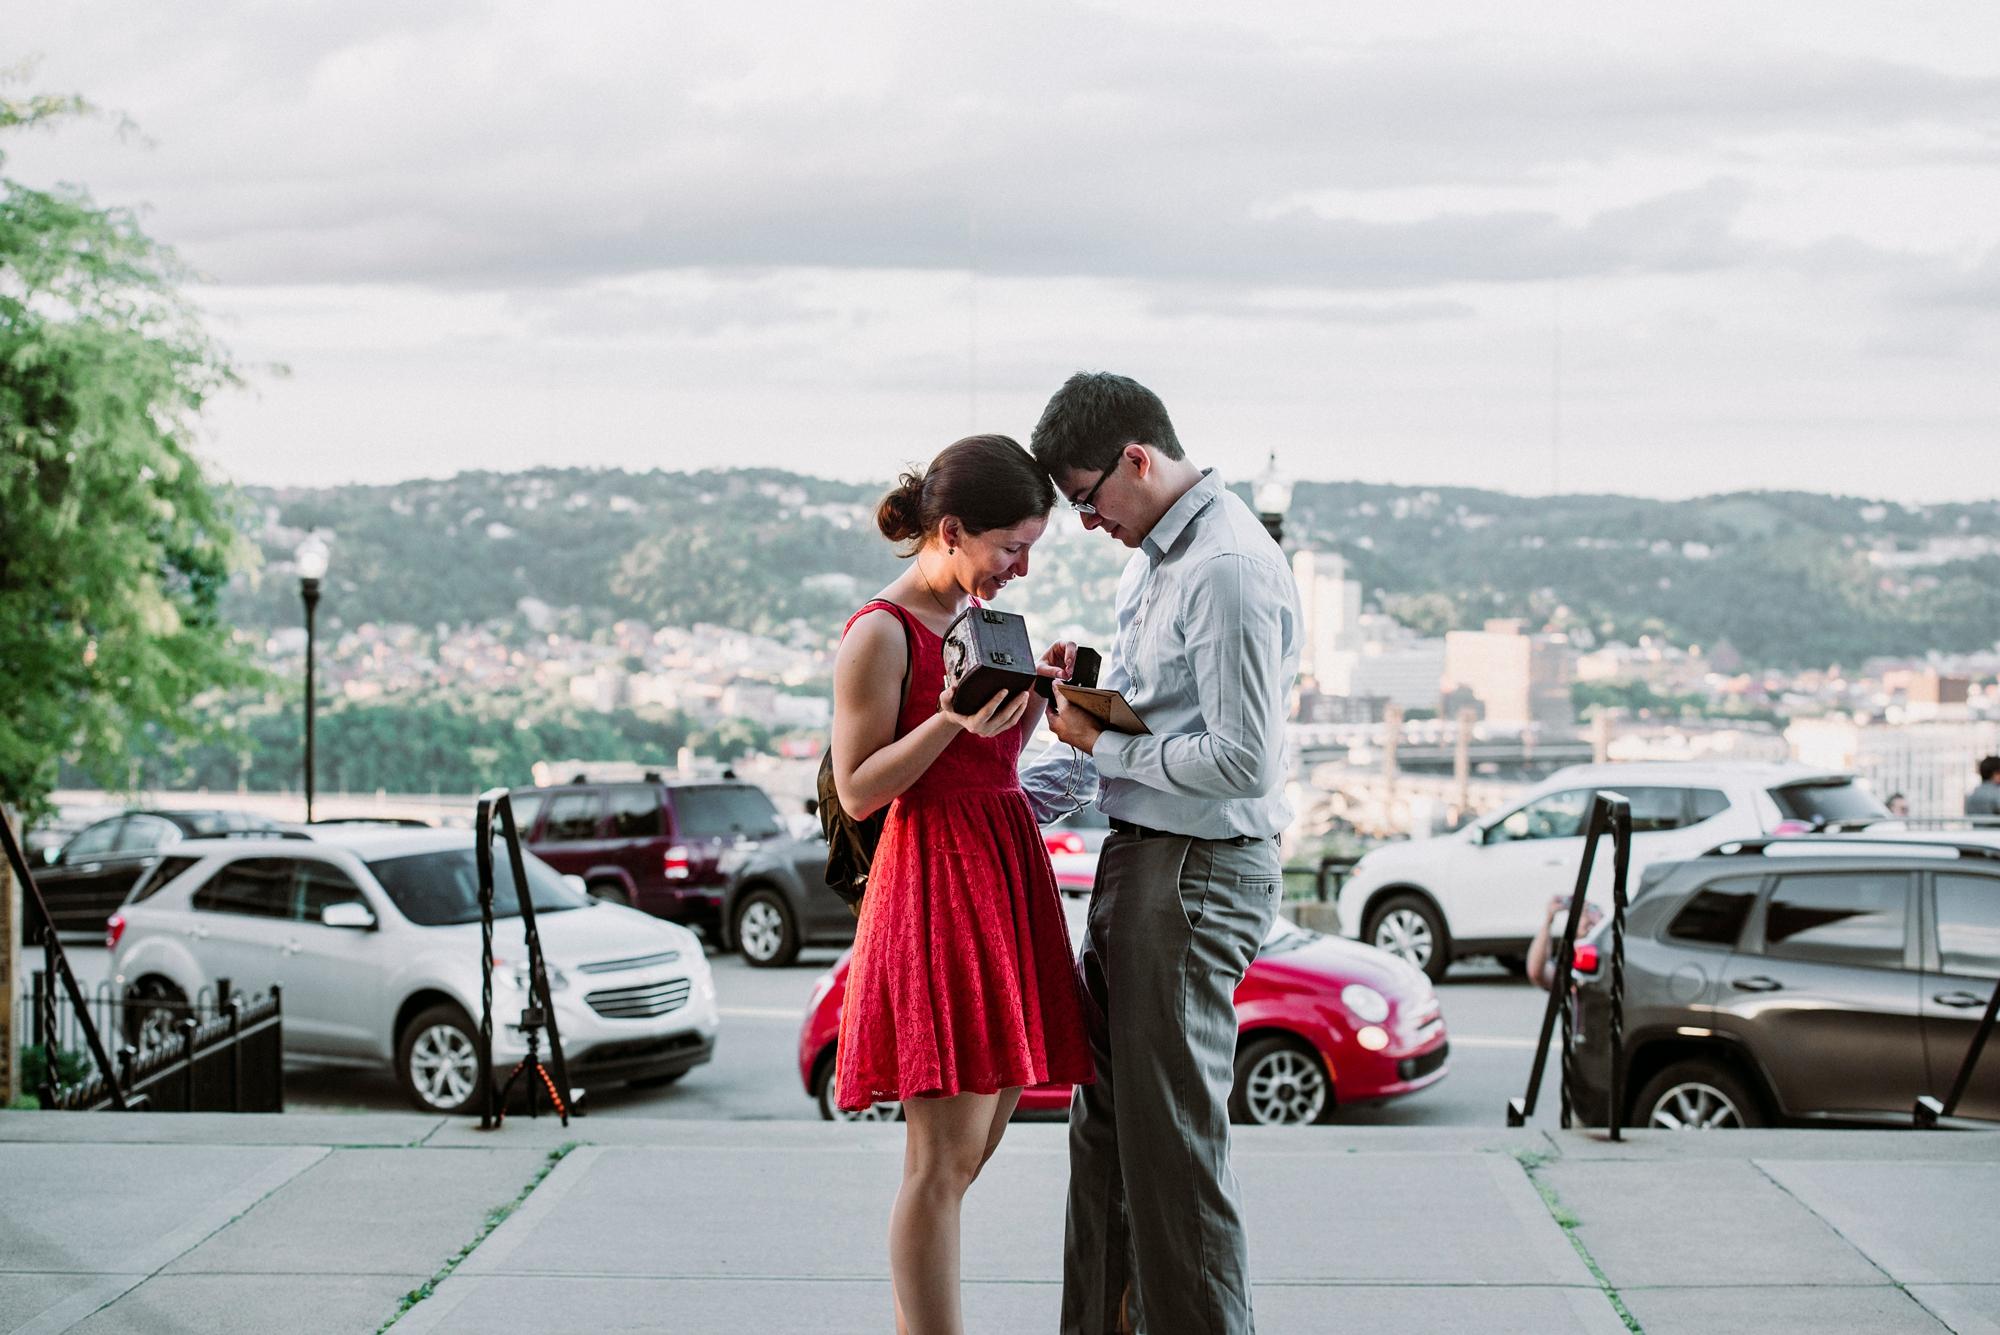 0120Jorge-Clara-Proposal-Pittsburgh_Proposal-Pittsburgh-Constructed-Adventures-Sandrachile.jpg